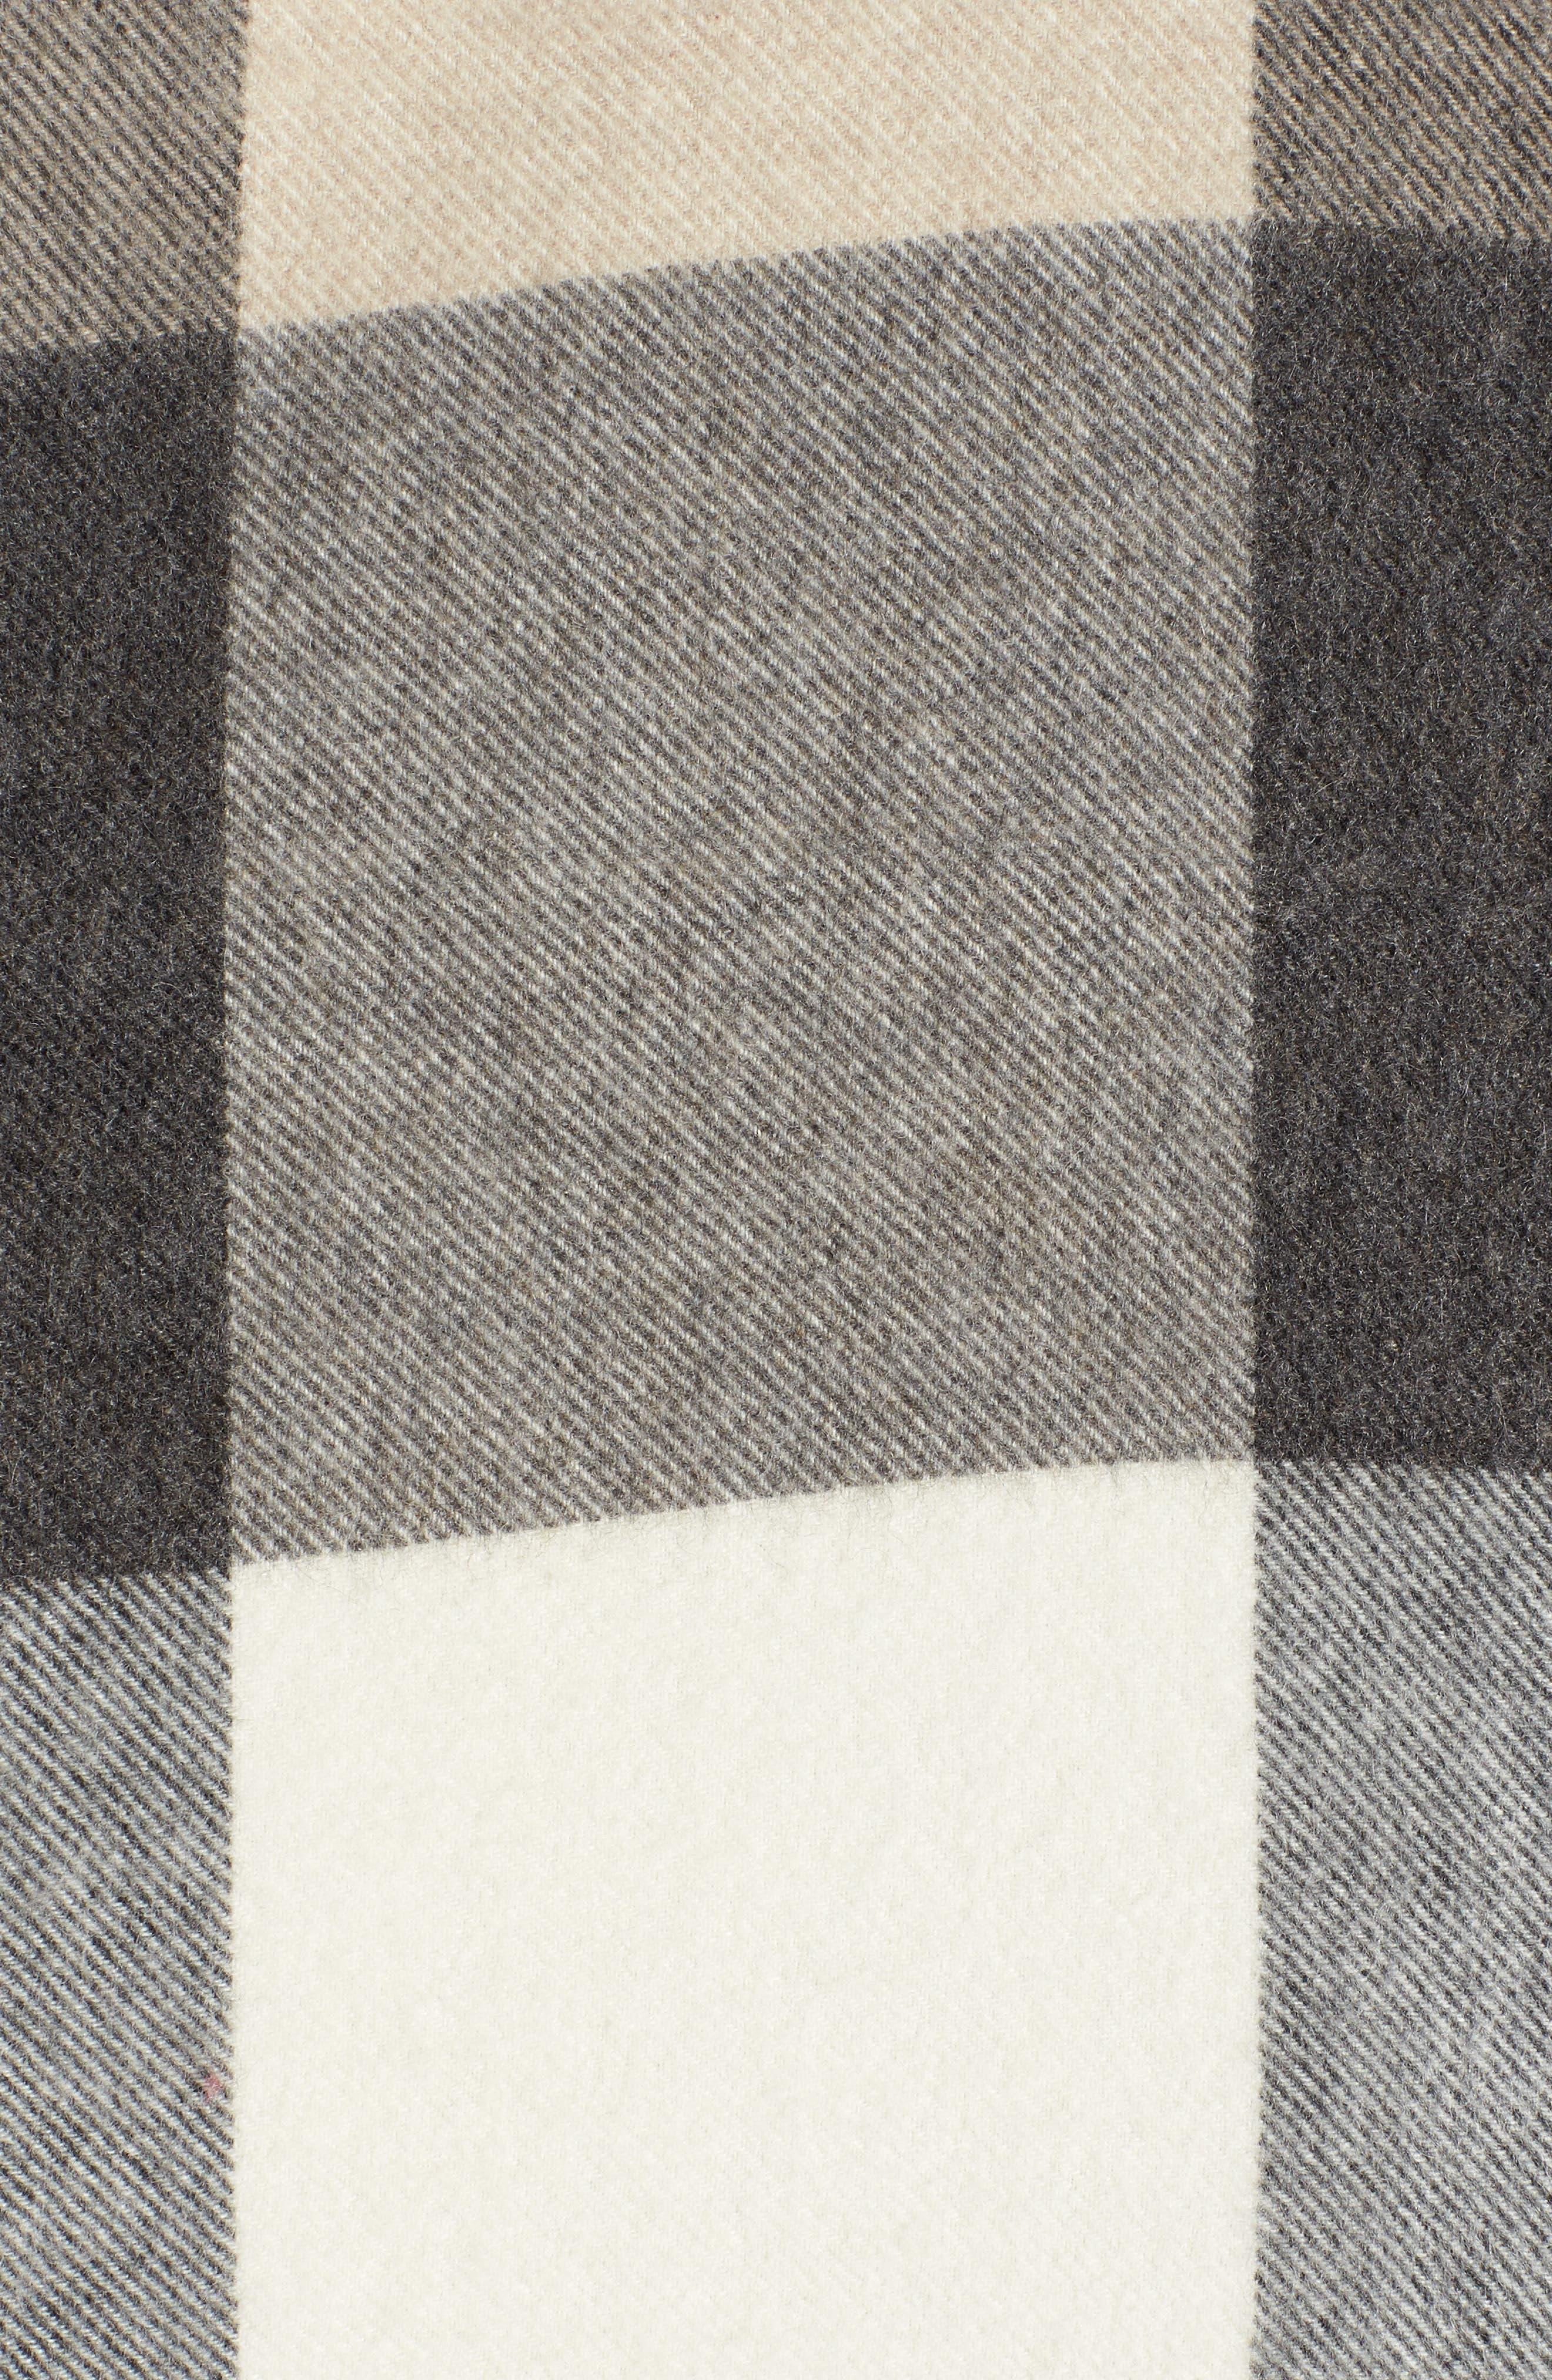 Nordstrom Buffalo Check Cashmere Wrap,                             Alternate thumbnail 5, color,                             001